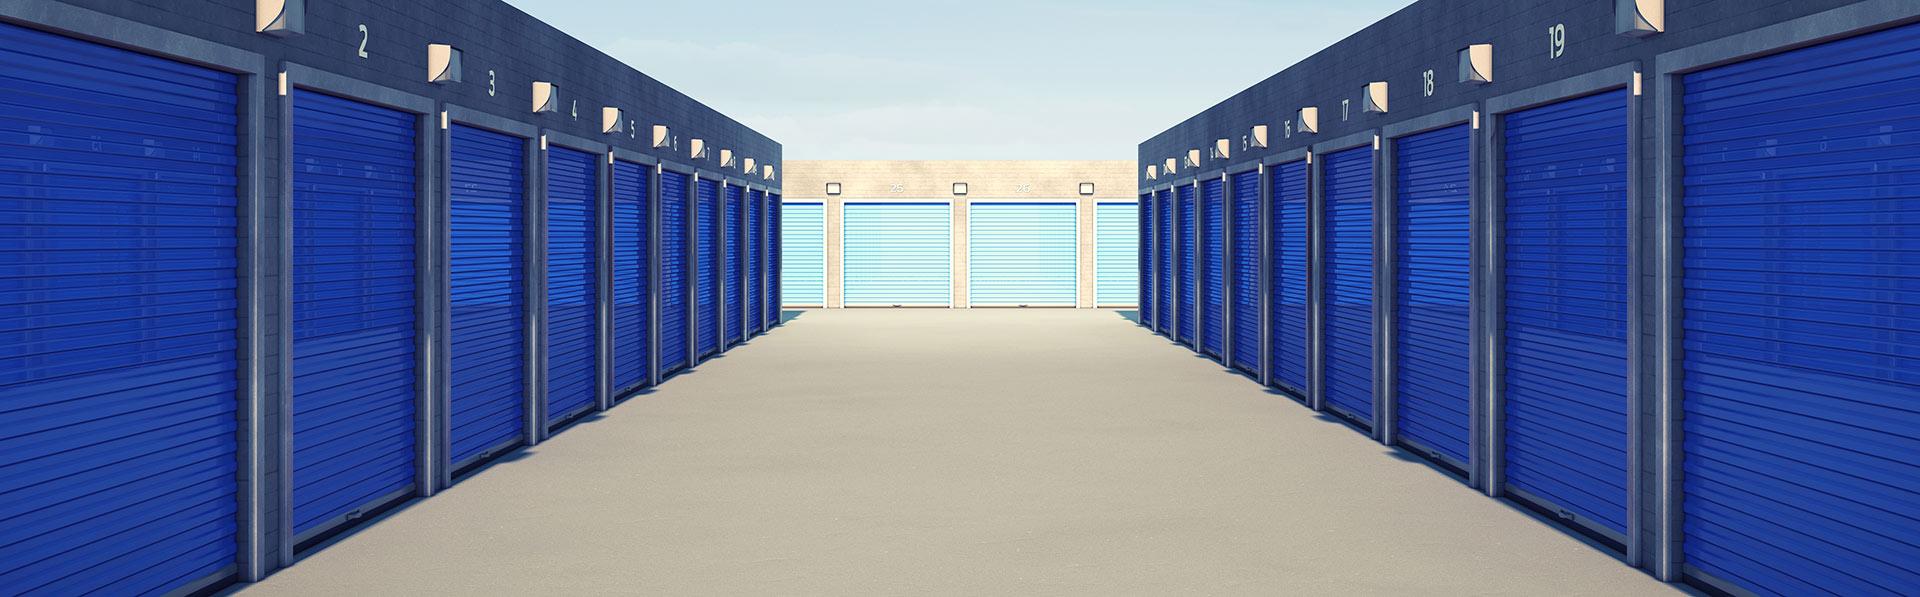 354 & Self Storage in Ashburn VA | Temperature Controled Storage Units